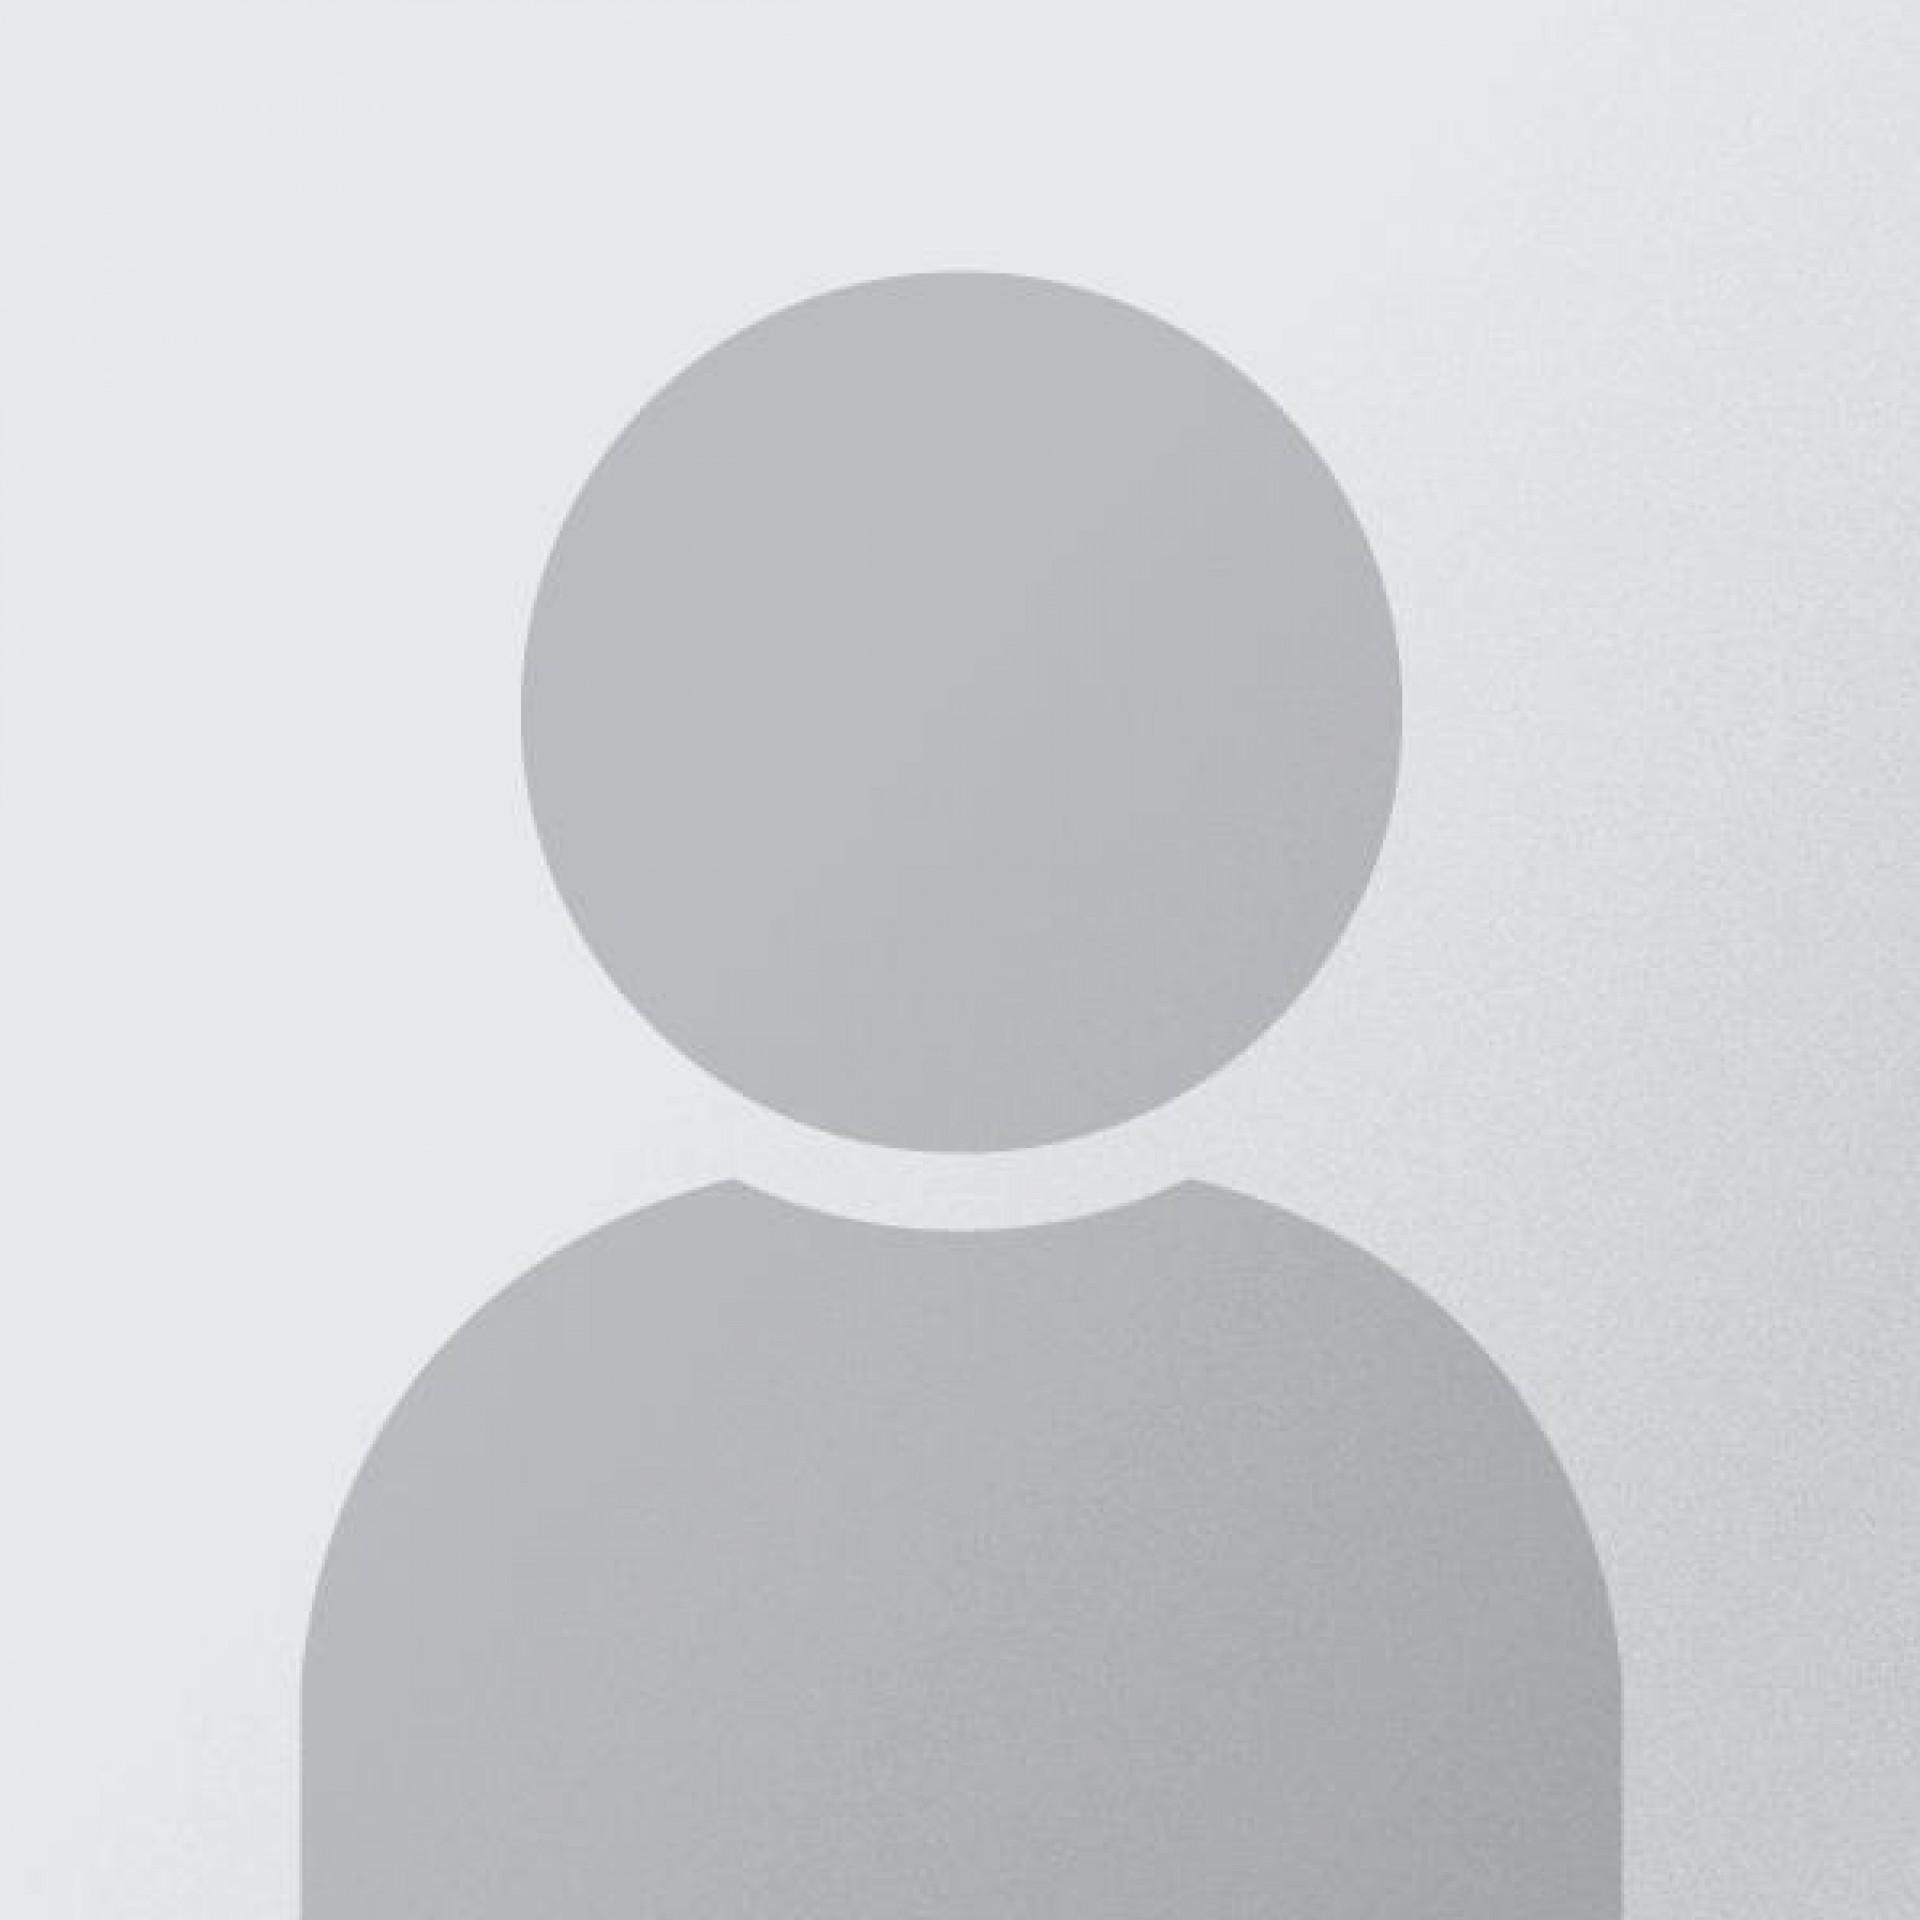 fotografia p021 profilu 01025M52MT